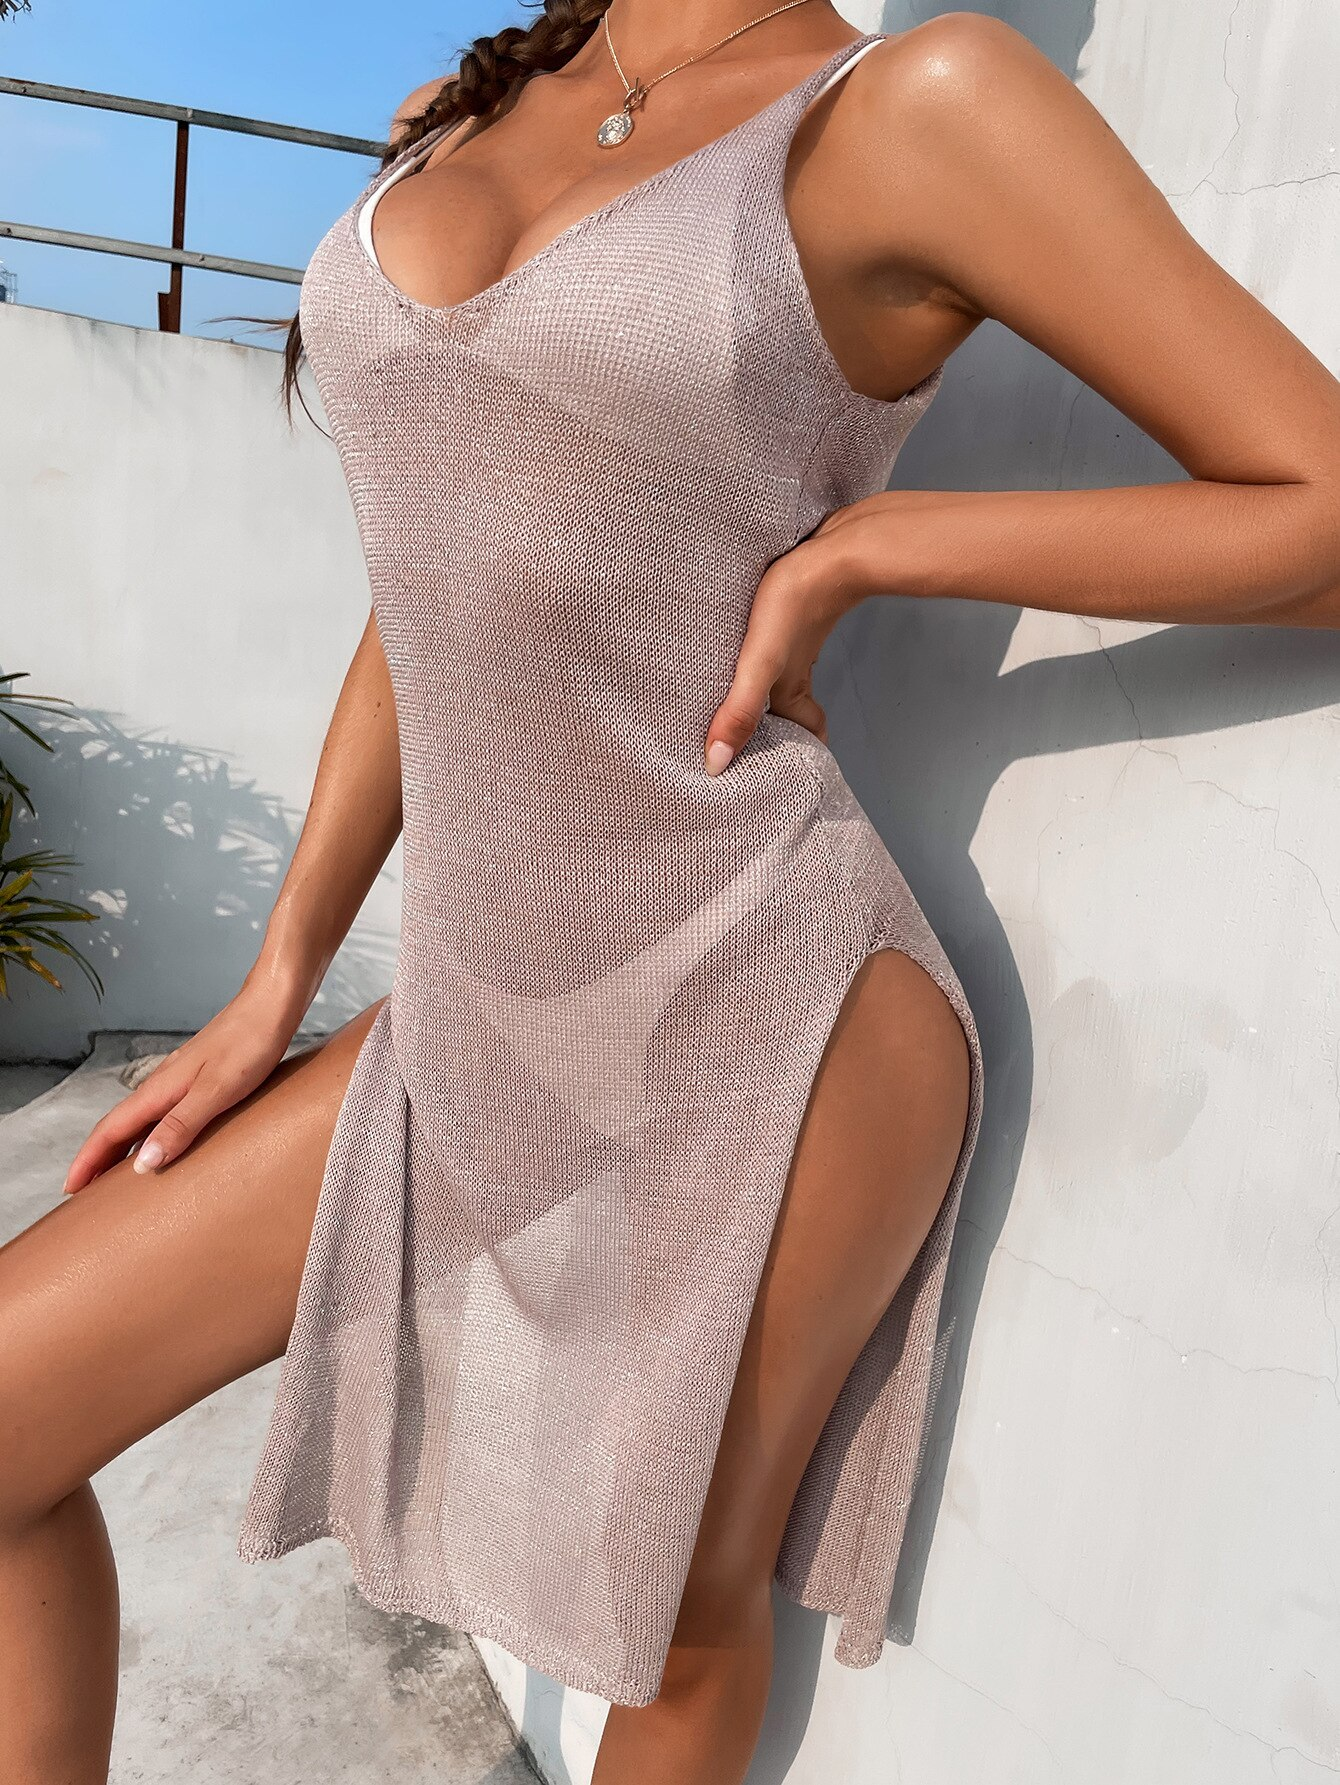 Oluolin Women 2021 Summer Mesh Sheer Long Cover-Ups Beach Dress Bikini Cover Up Swimwear Swimsuit Dress Plage Beachwear